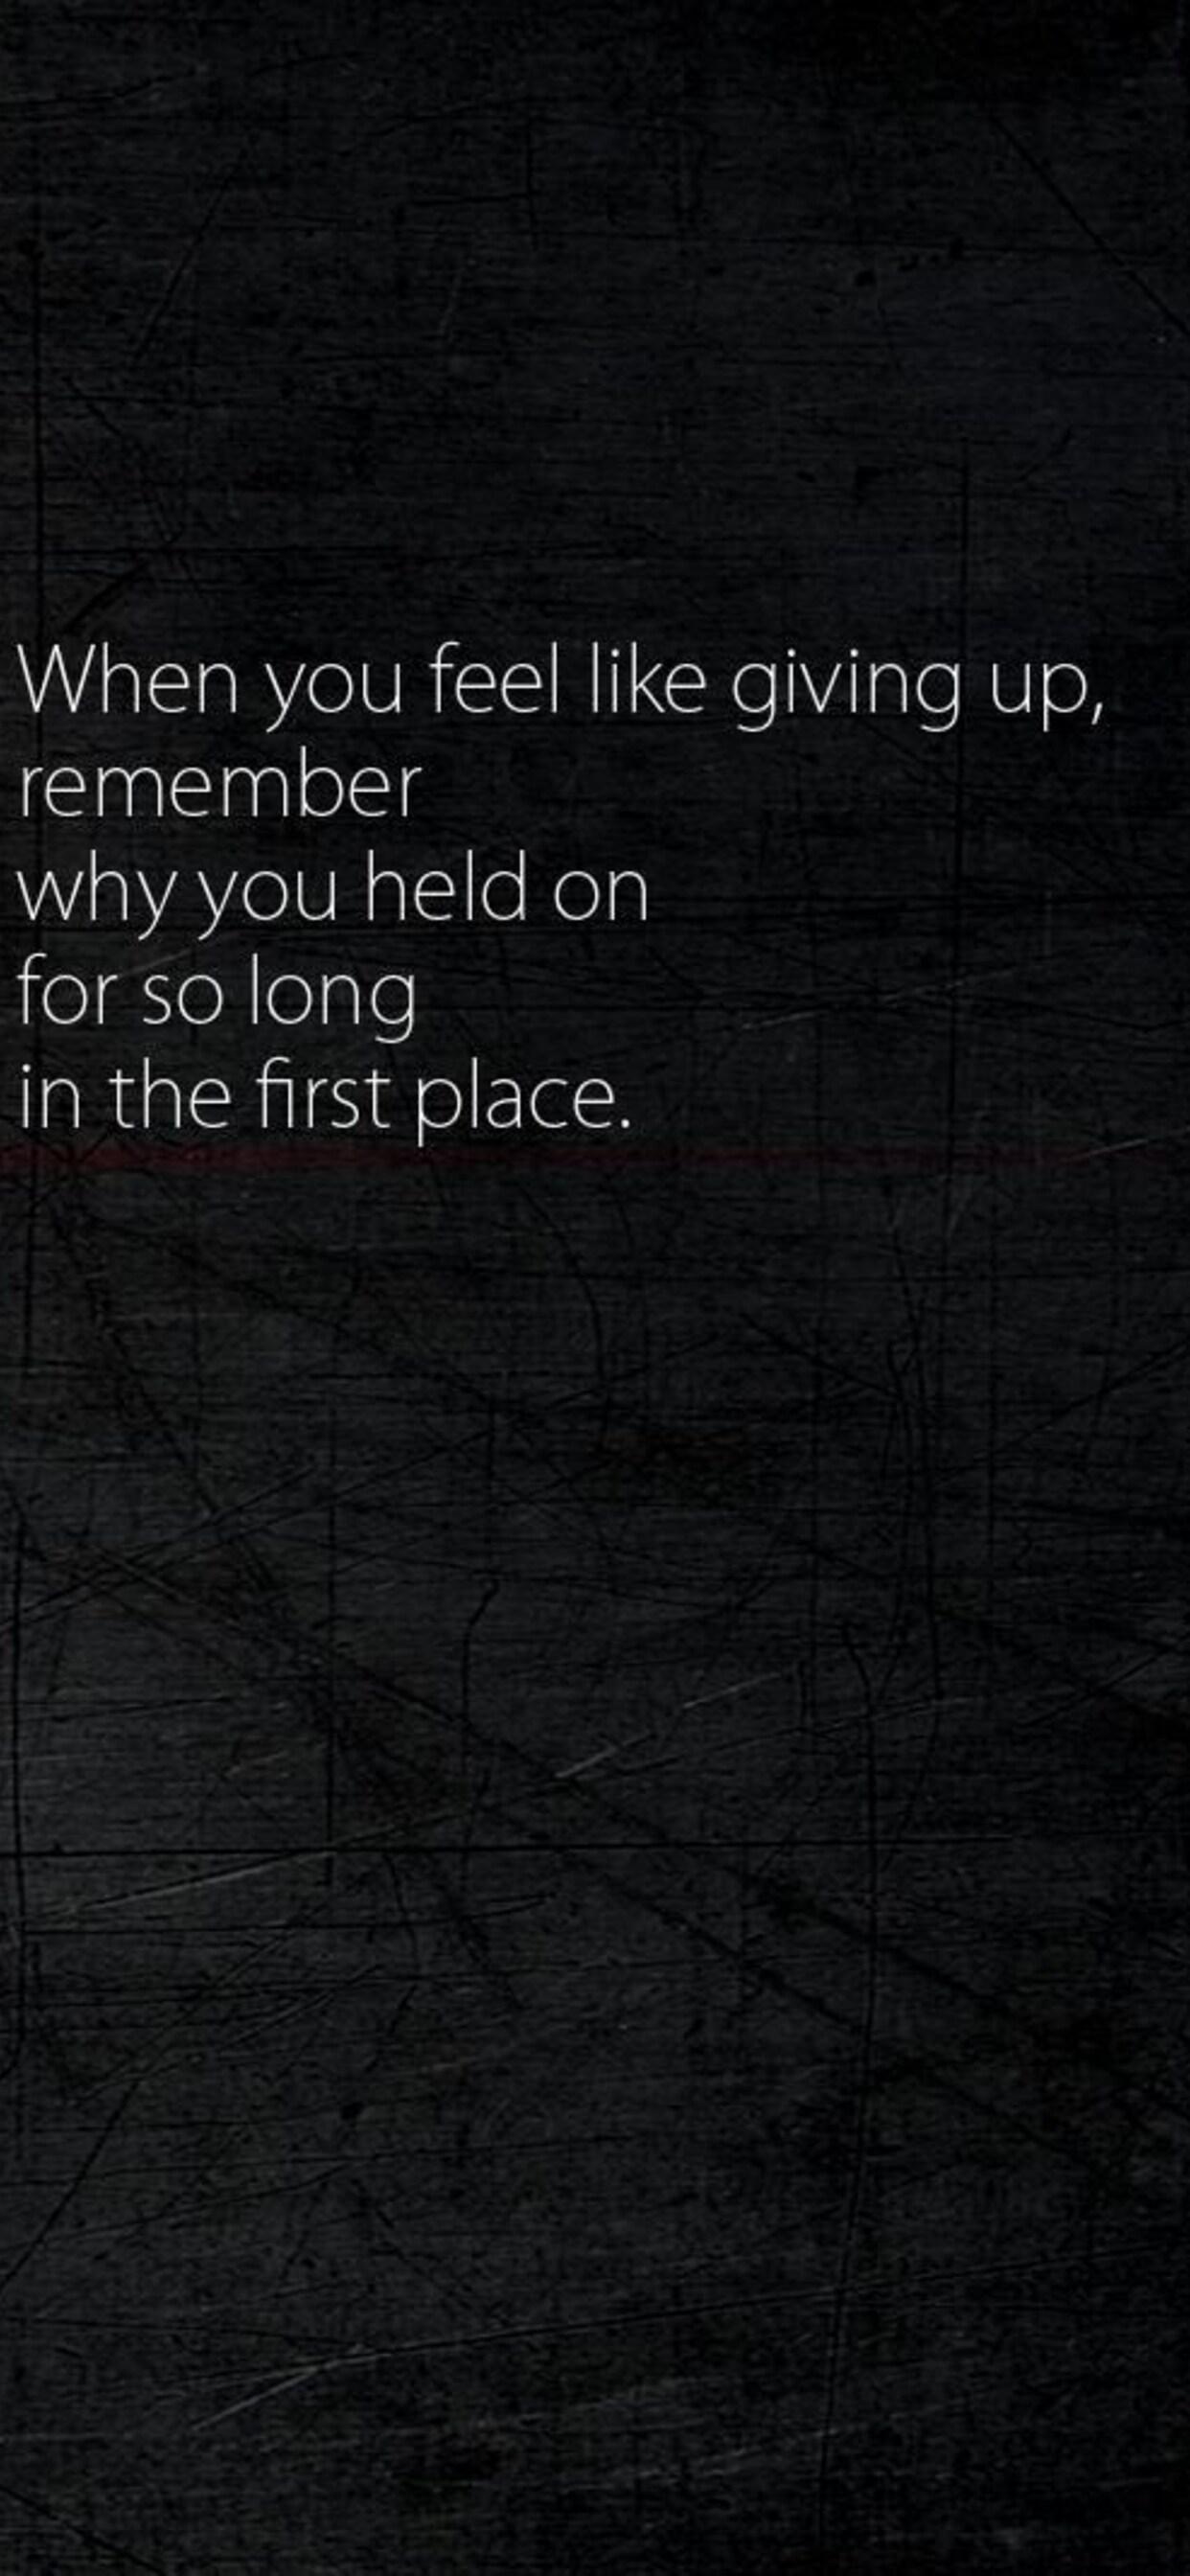 Iphone Xs Max Wallpaper Quotes